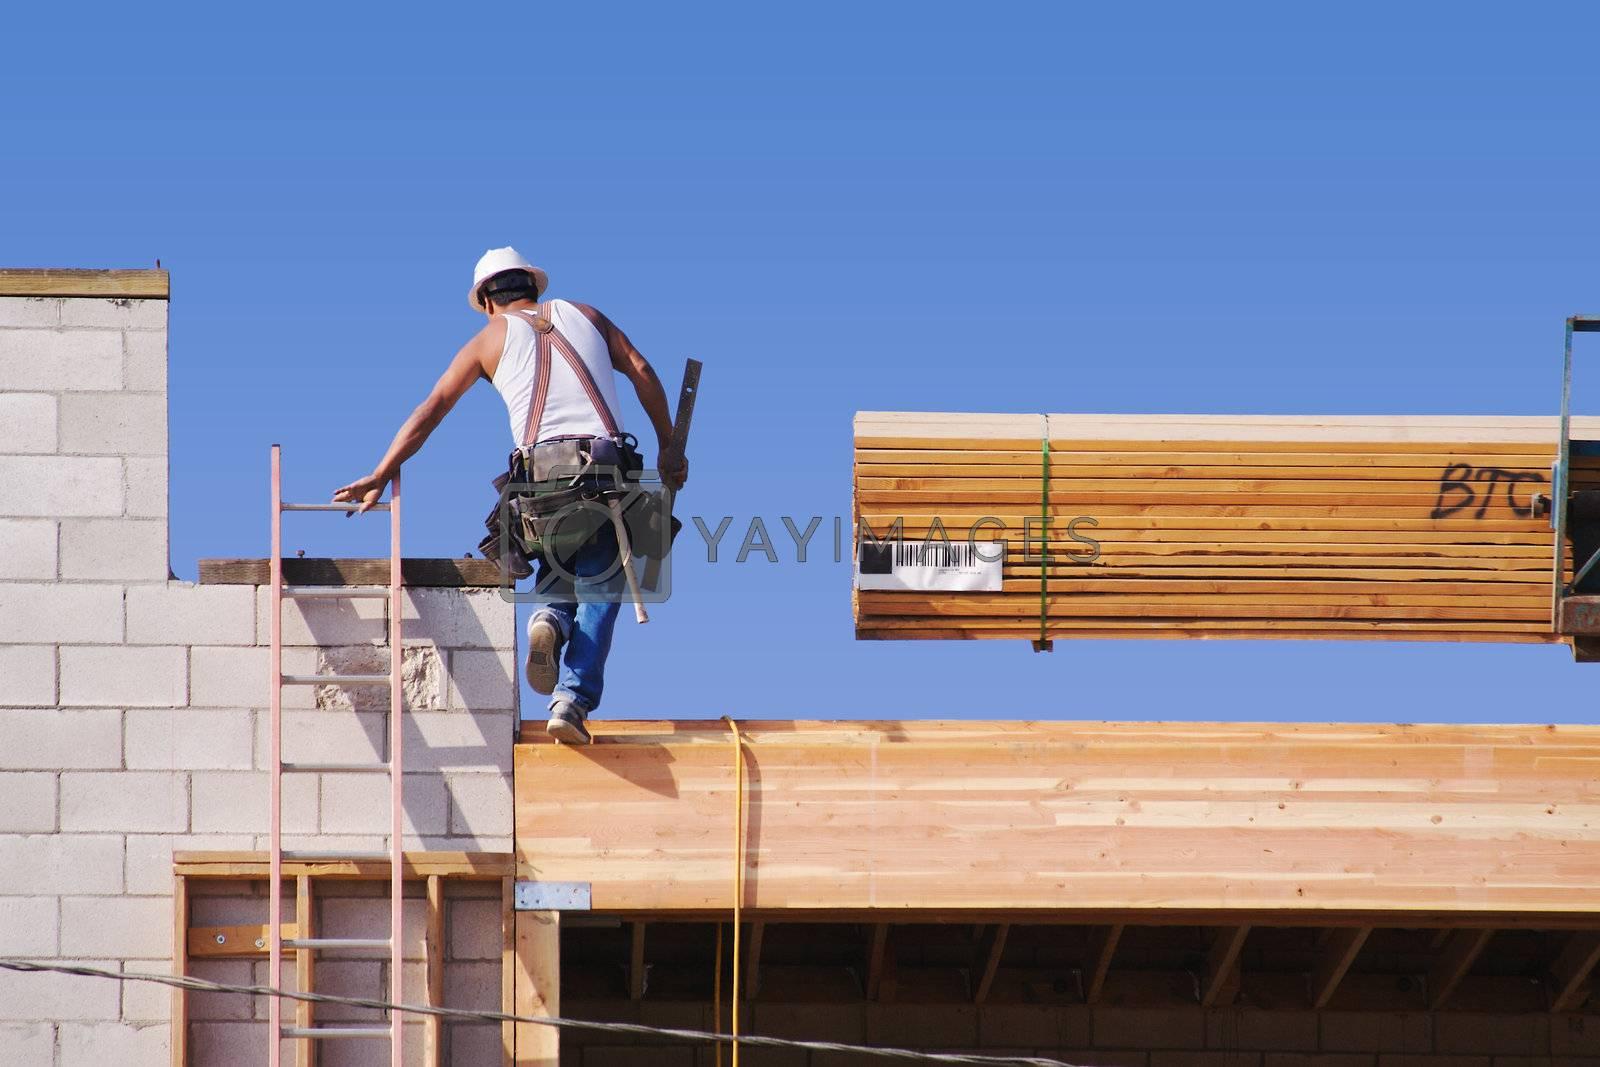 Carpenter climbing up ladder at a construction scene.